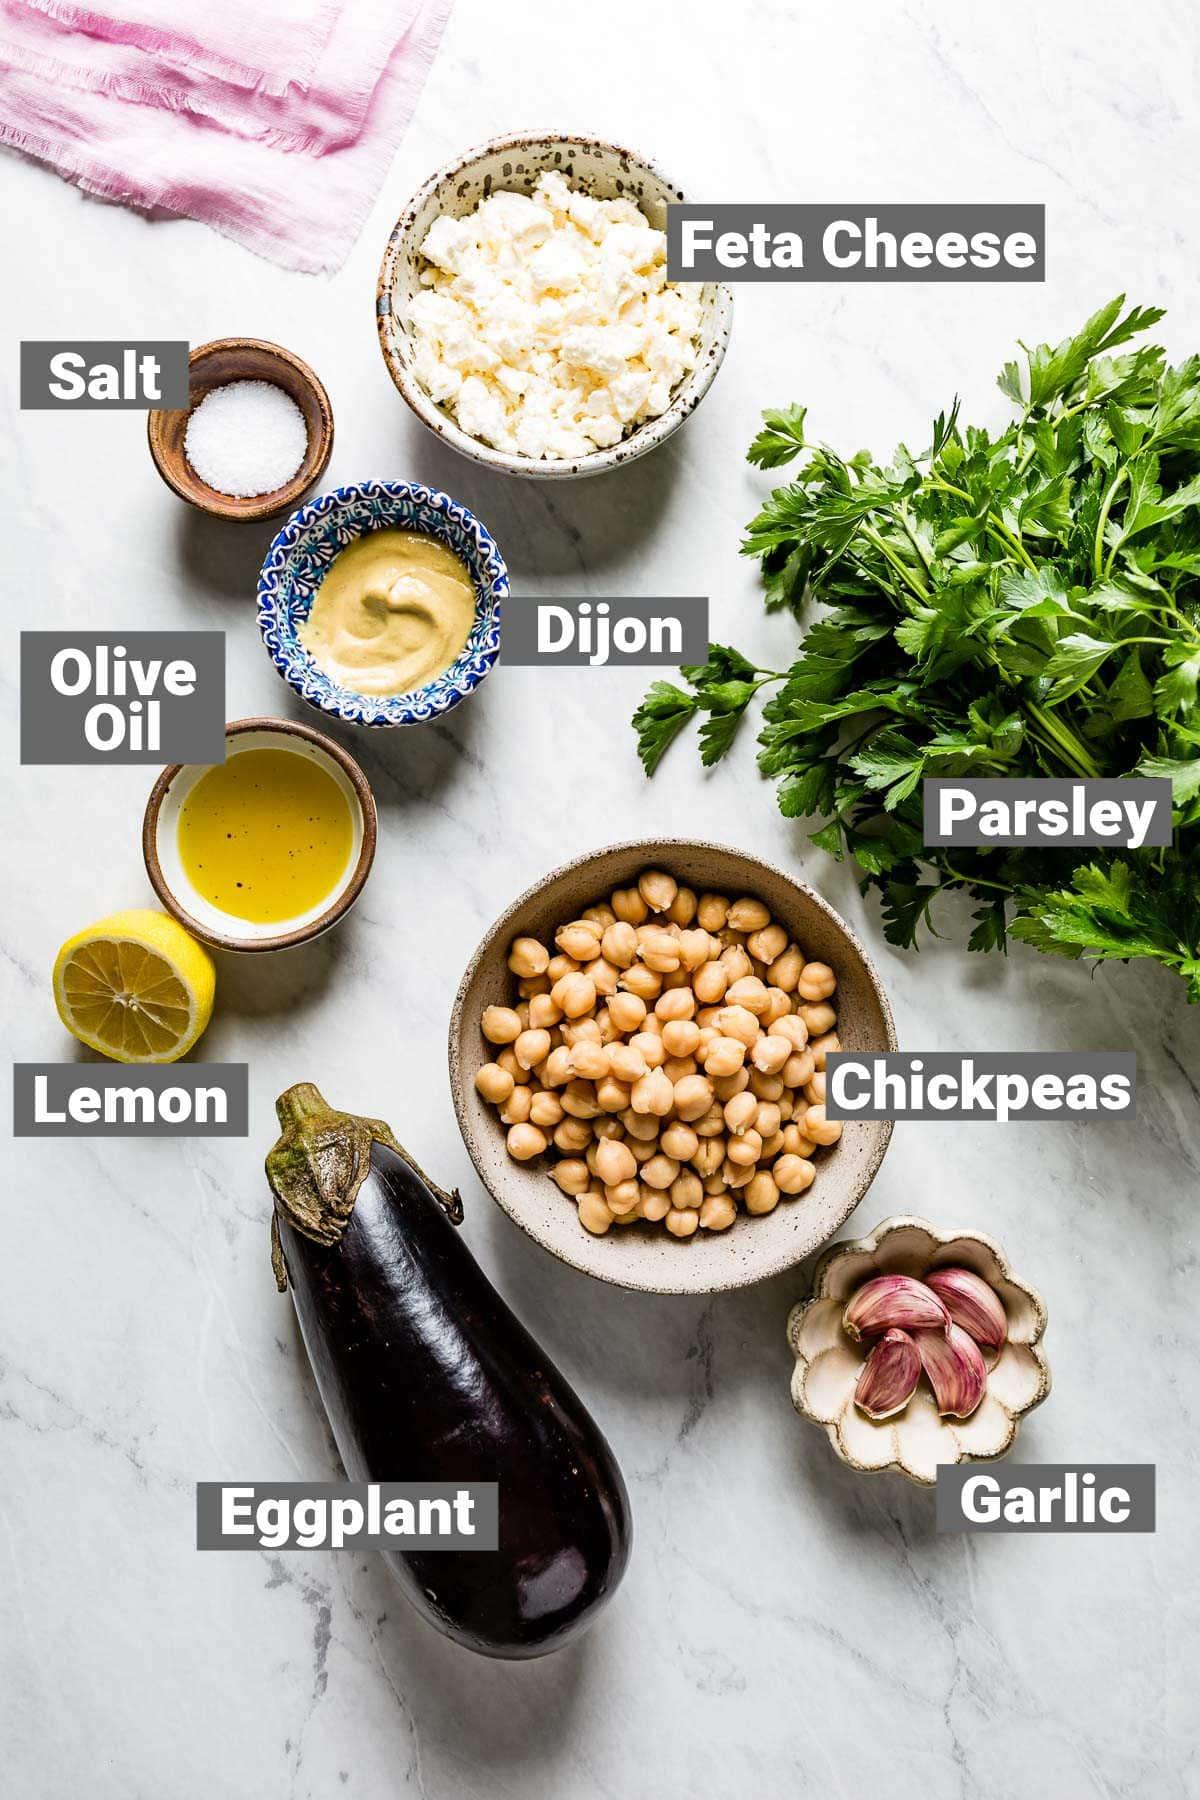 ingredients for roasted eggplant salad